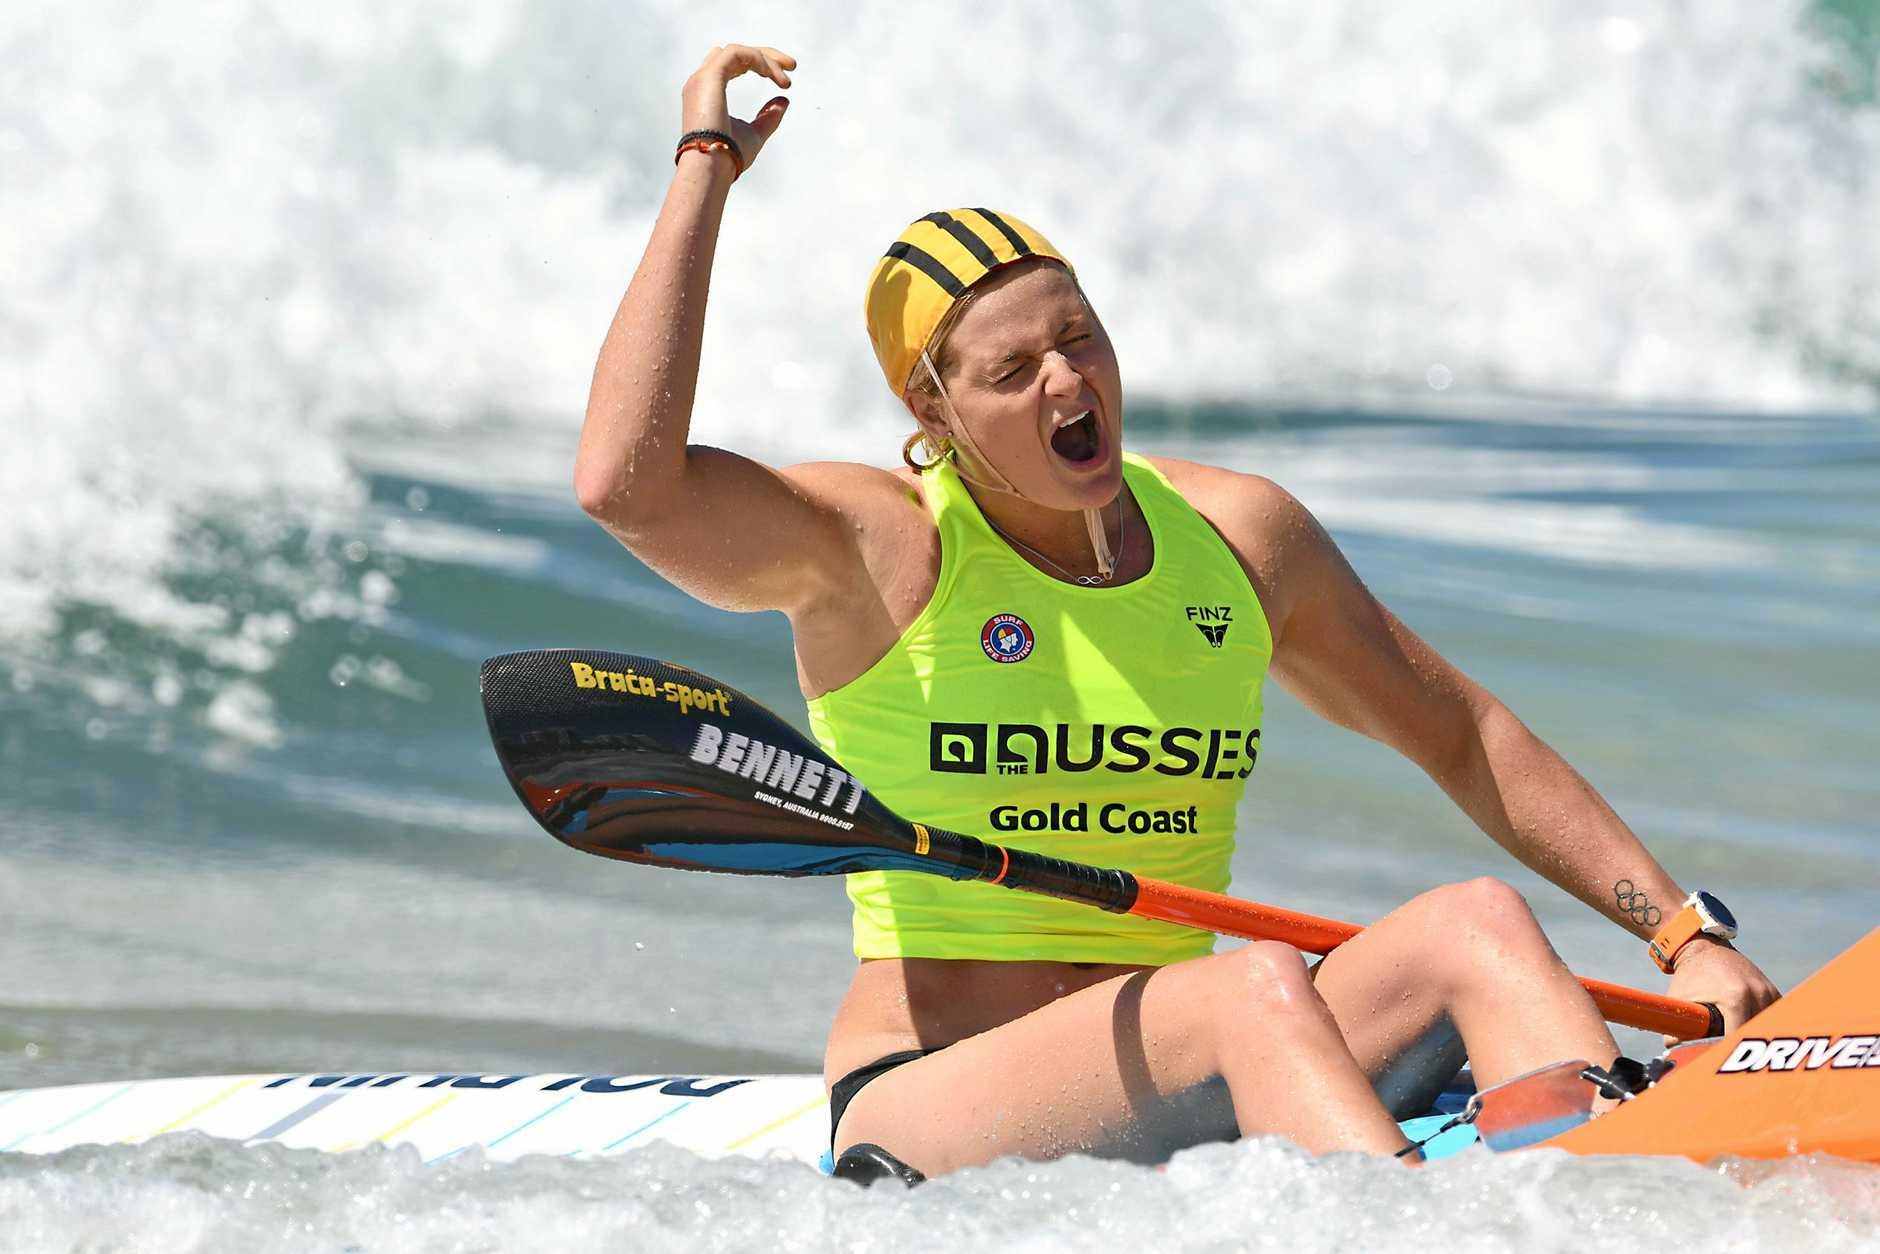 Alexandra Headland athlete Alyssa Bull won four gold medals during the Australian Surf Life Saving Championships